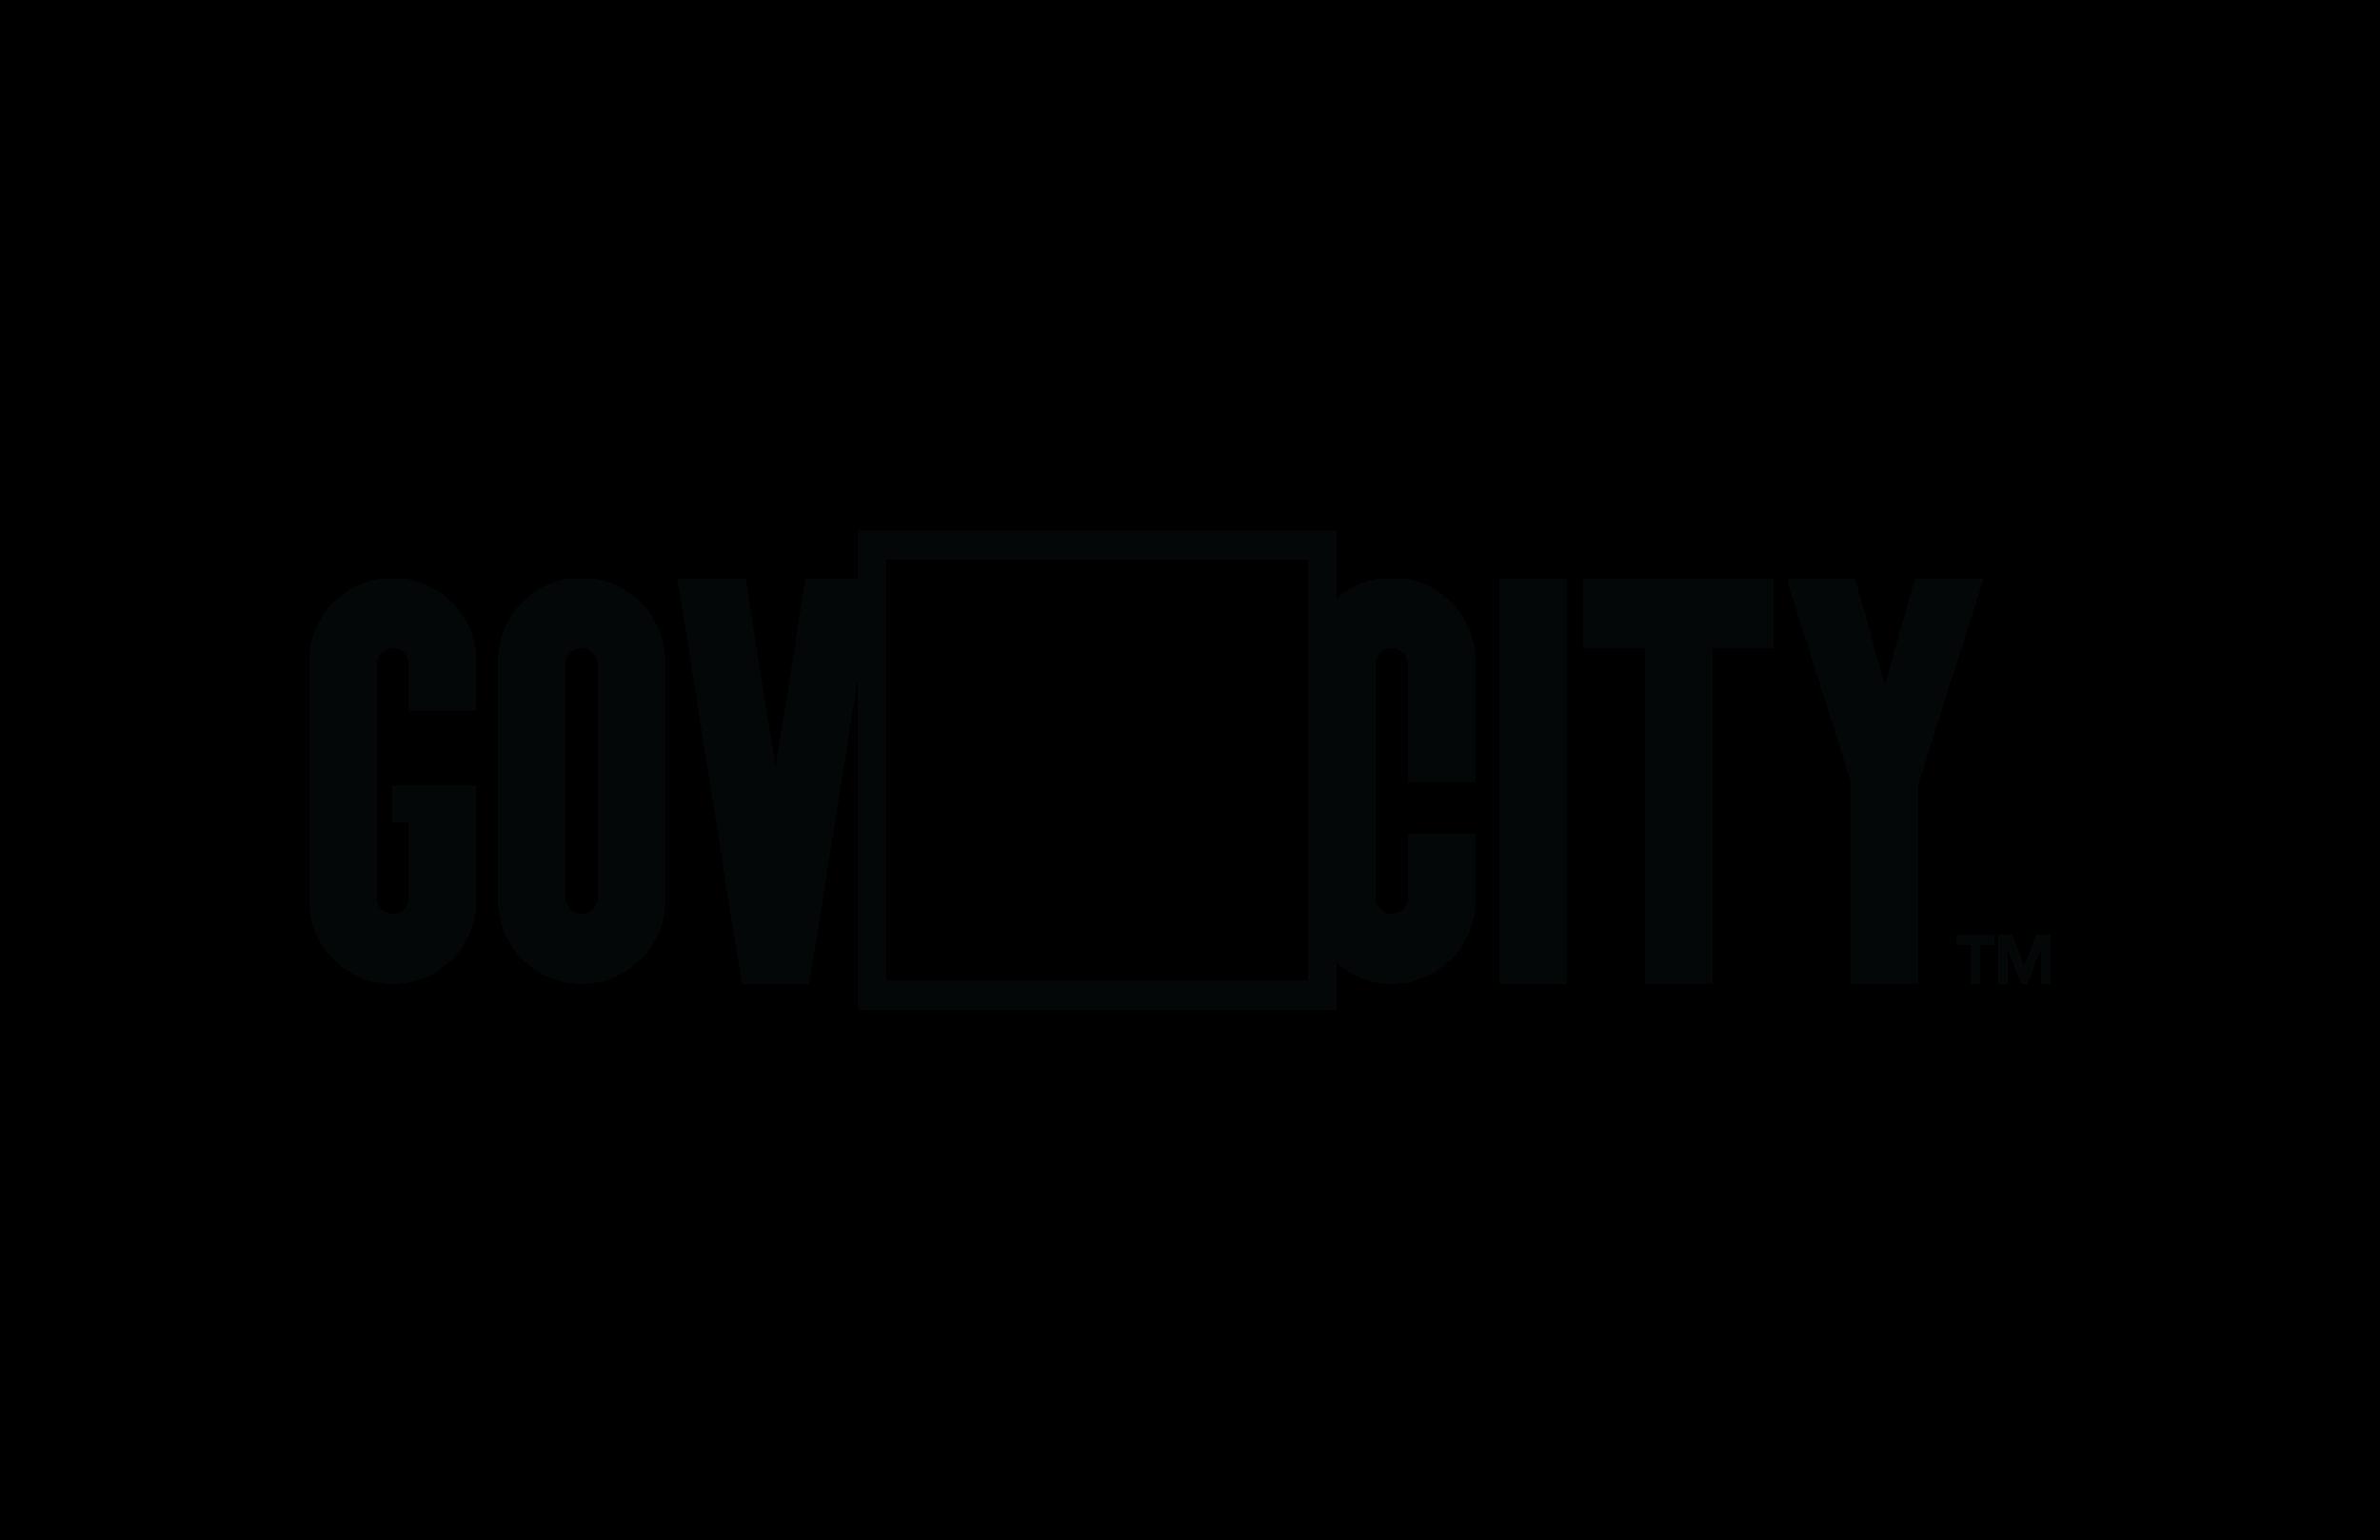 GovCity_FinalLogo-03.png